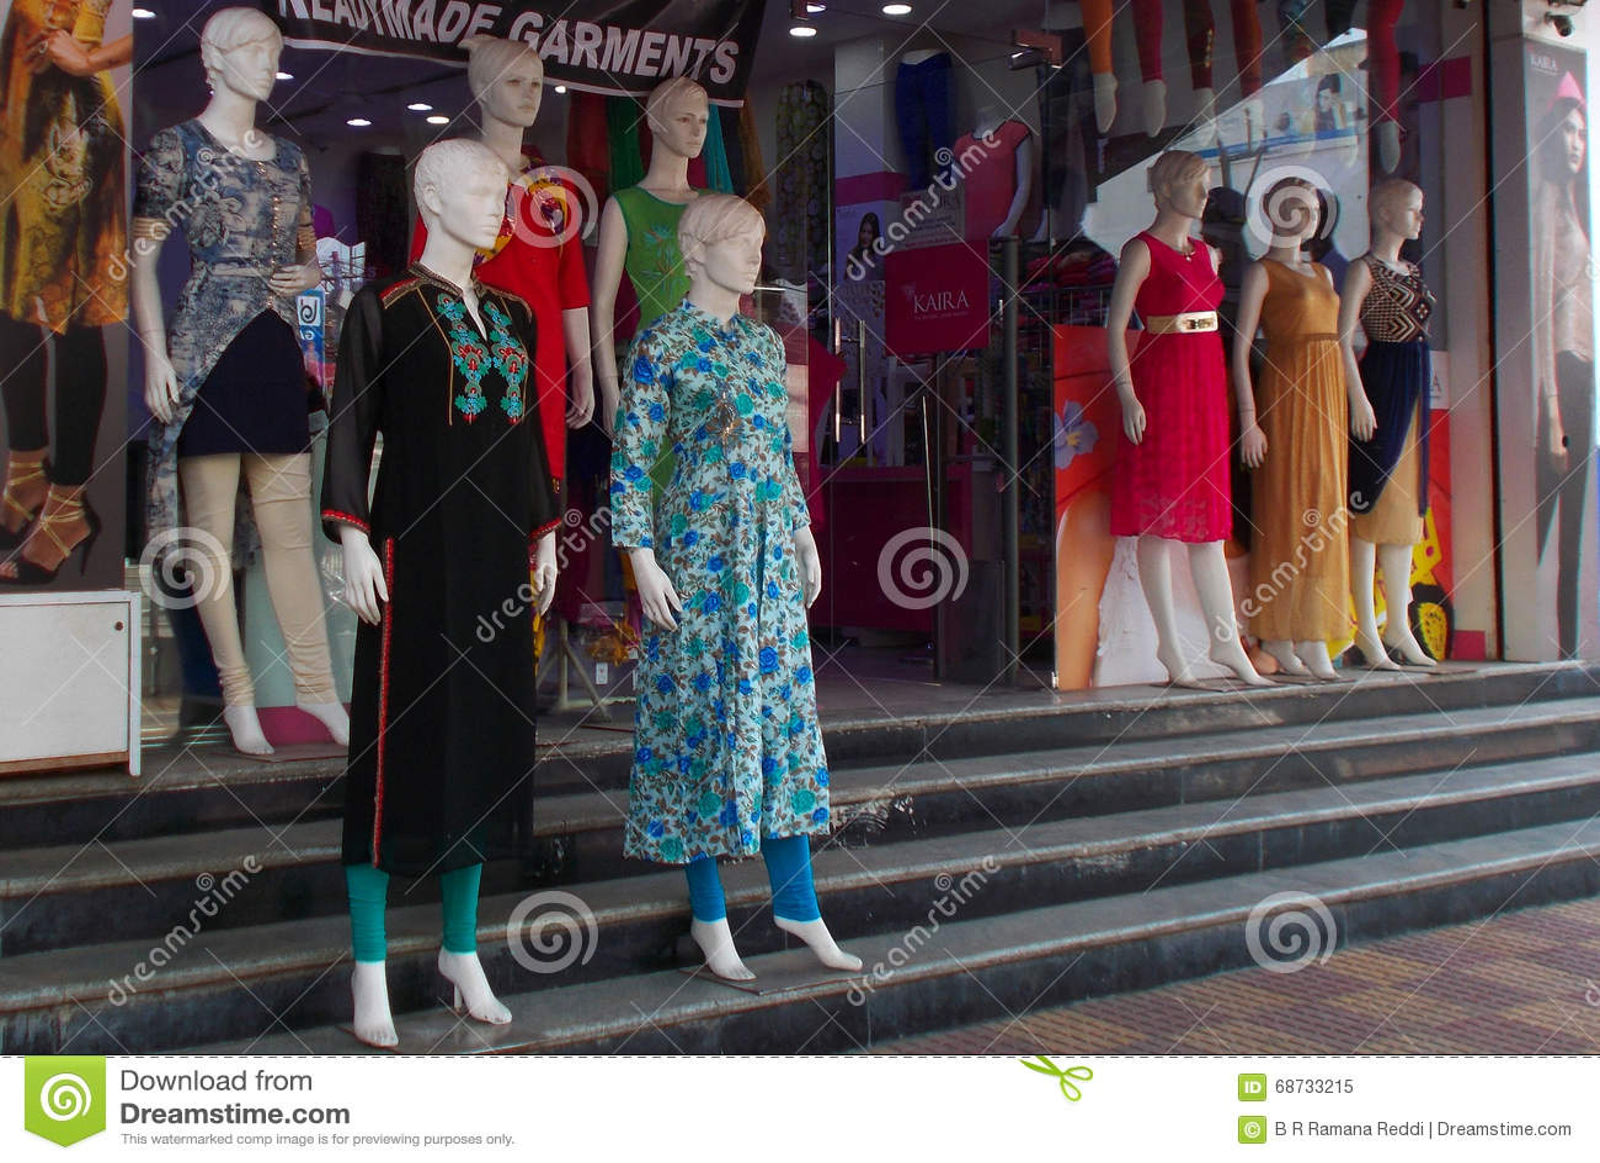 Indian clothing store sacramento